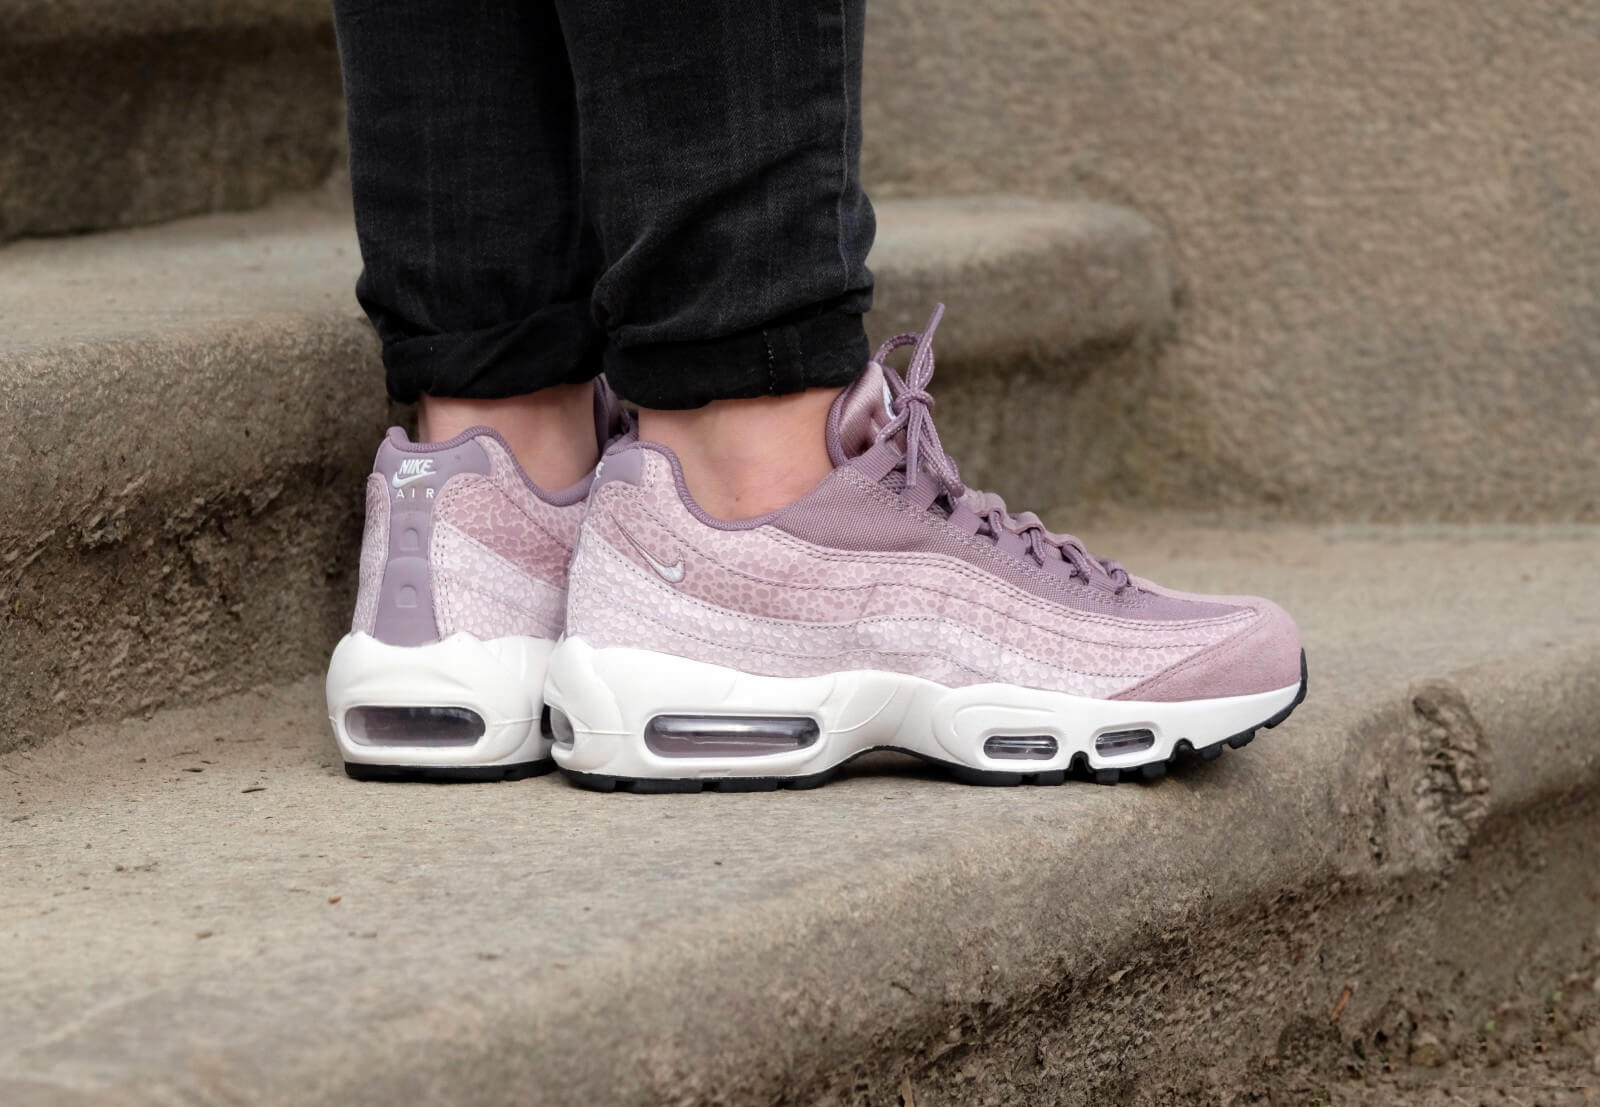 Nike Air Max 95 Premium Purple SMOKE (807443 502) Femmes